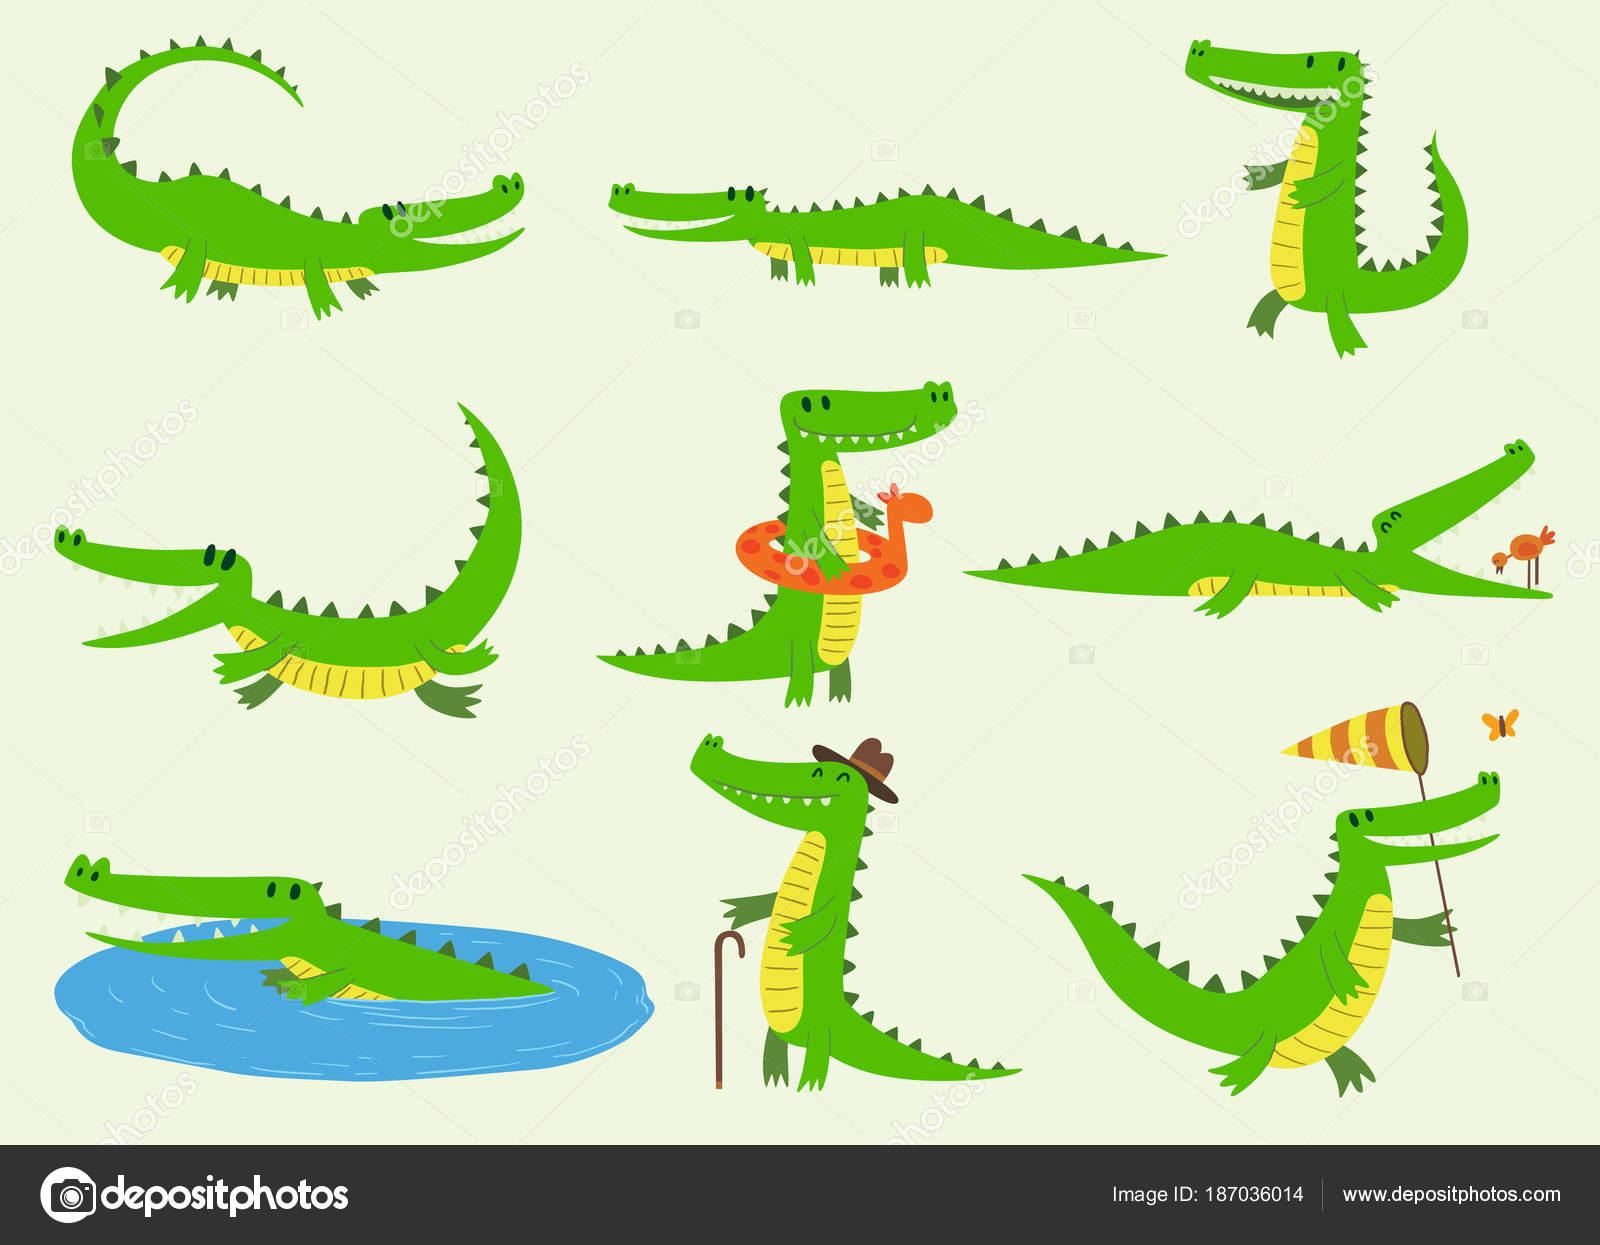 Vecteur de dessin anim caract res de crocodiles animaux de zoo vert diff rentes animal dr le - Dessin anime les crocodiles ...